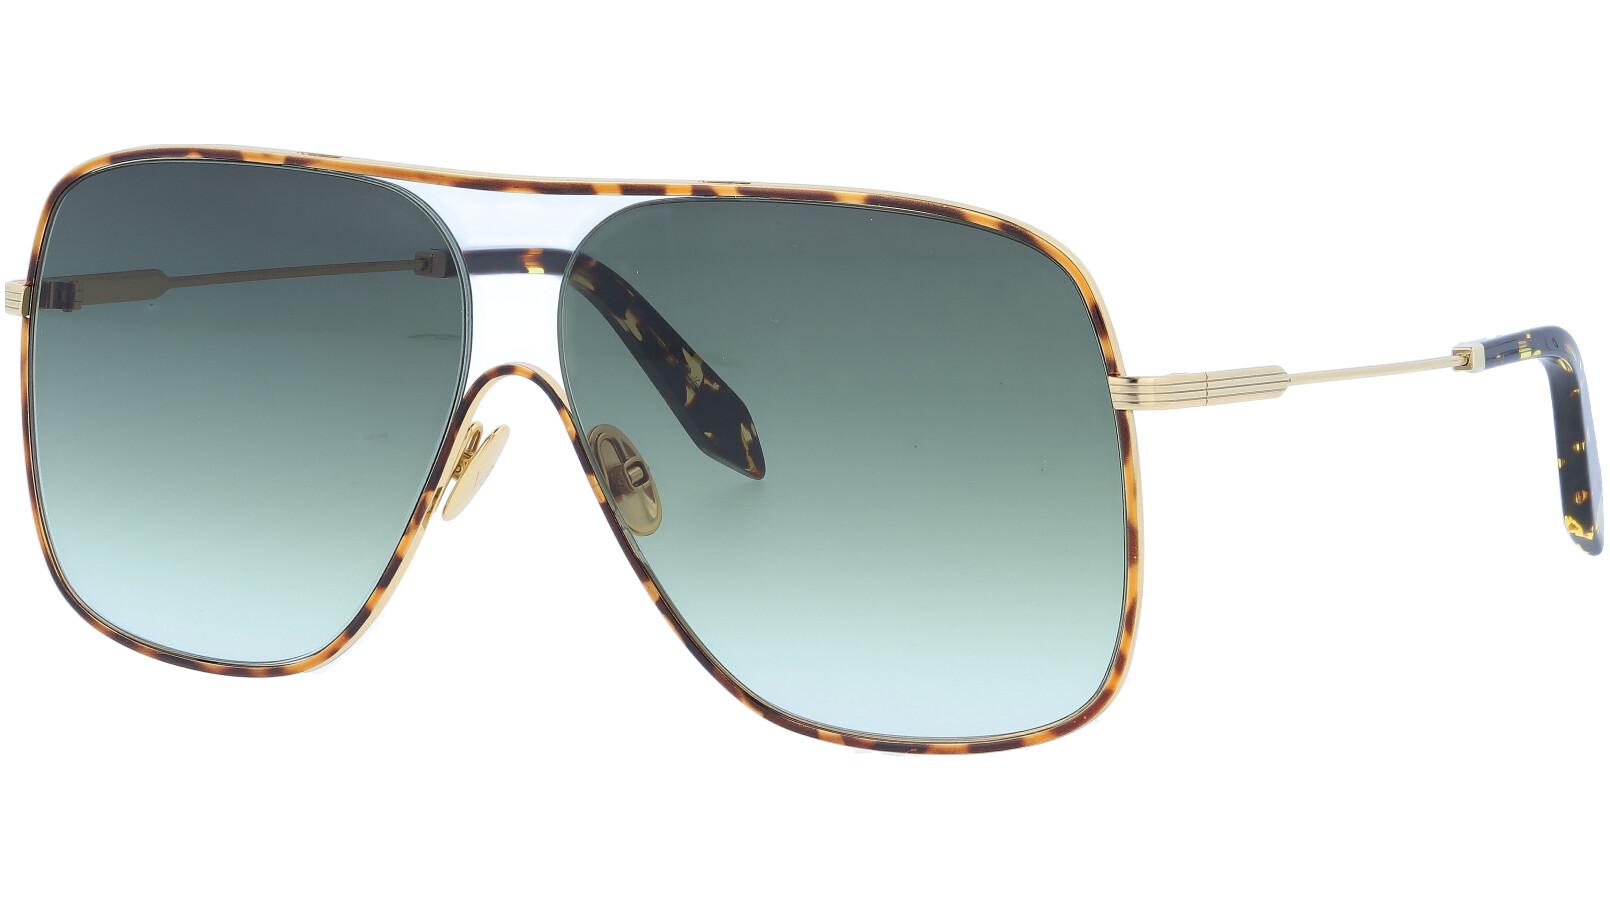 Victoria Beckham VB132S C04 61 Loop Sunglasses